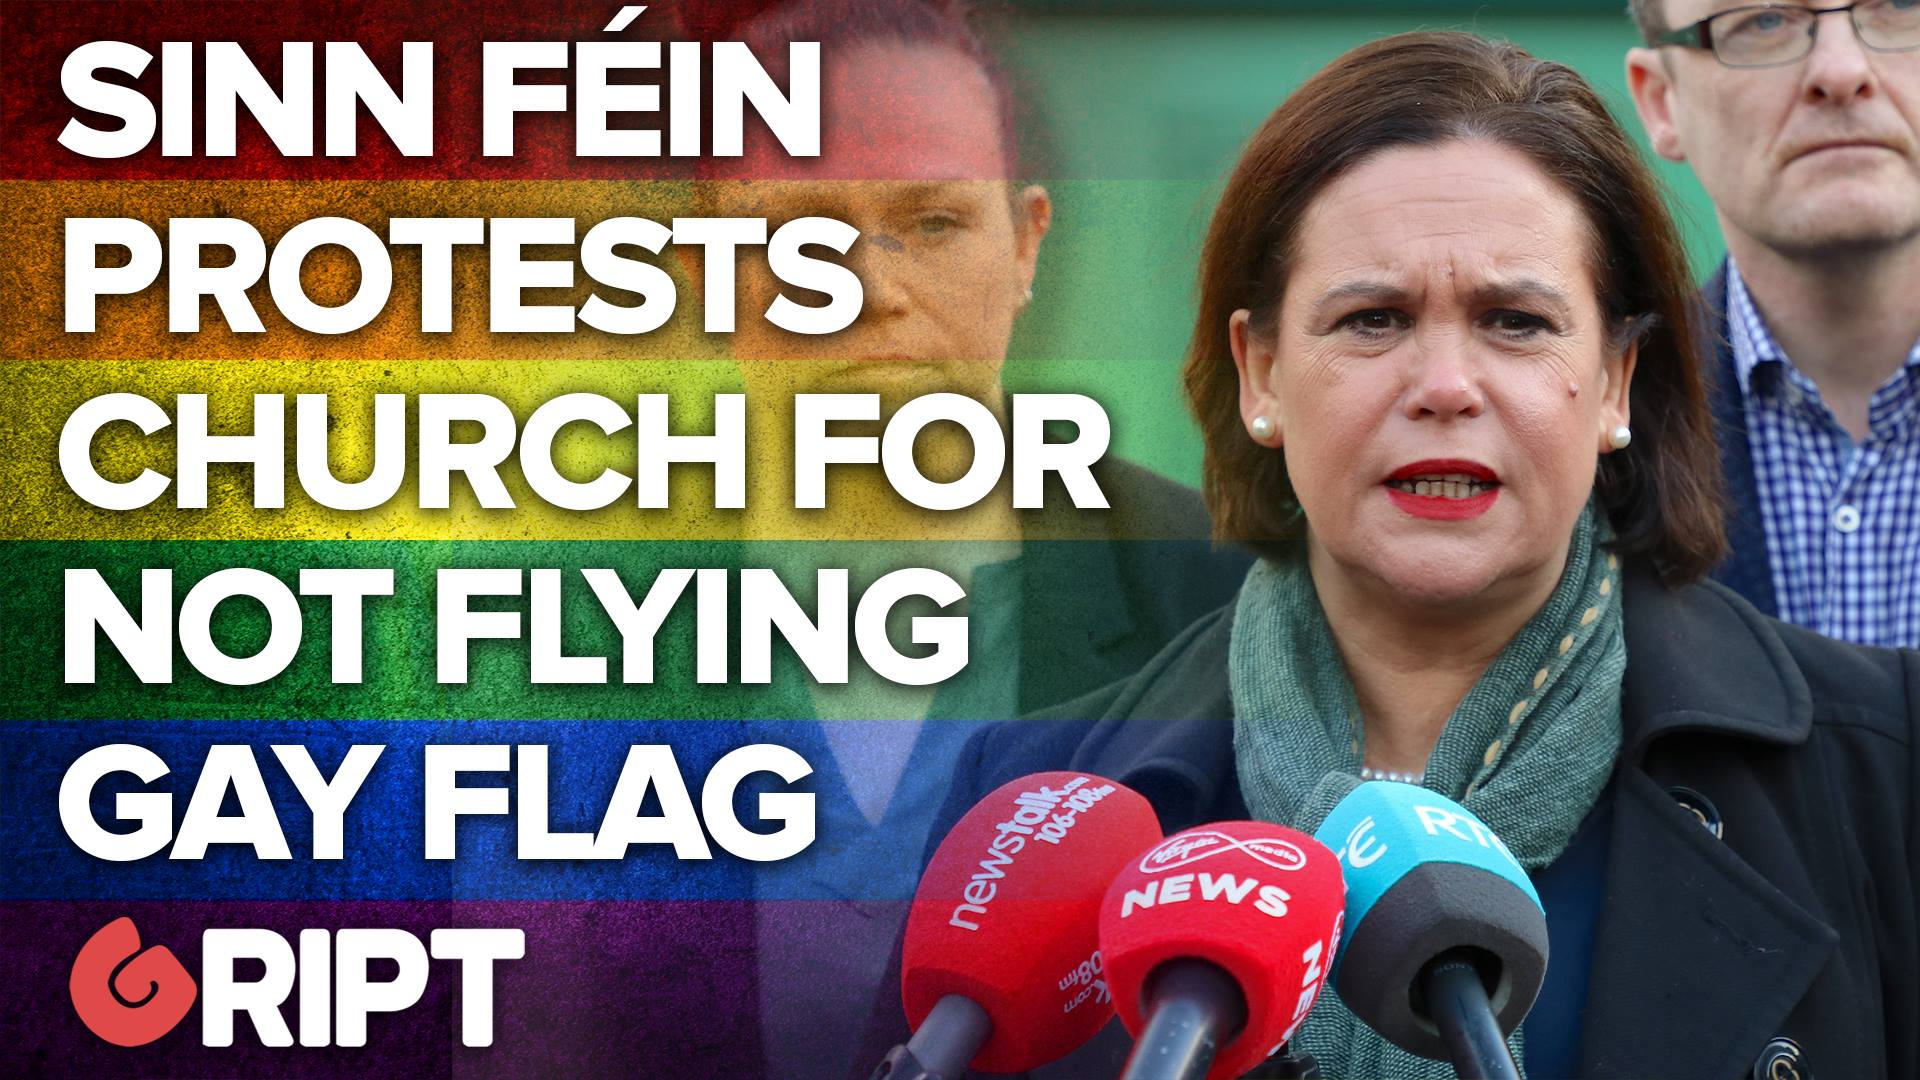 Sinn Féin protests outside Catholic Church for not flying gay pride flag